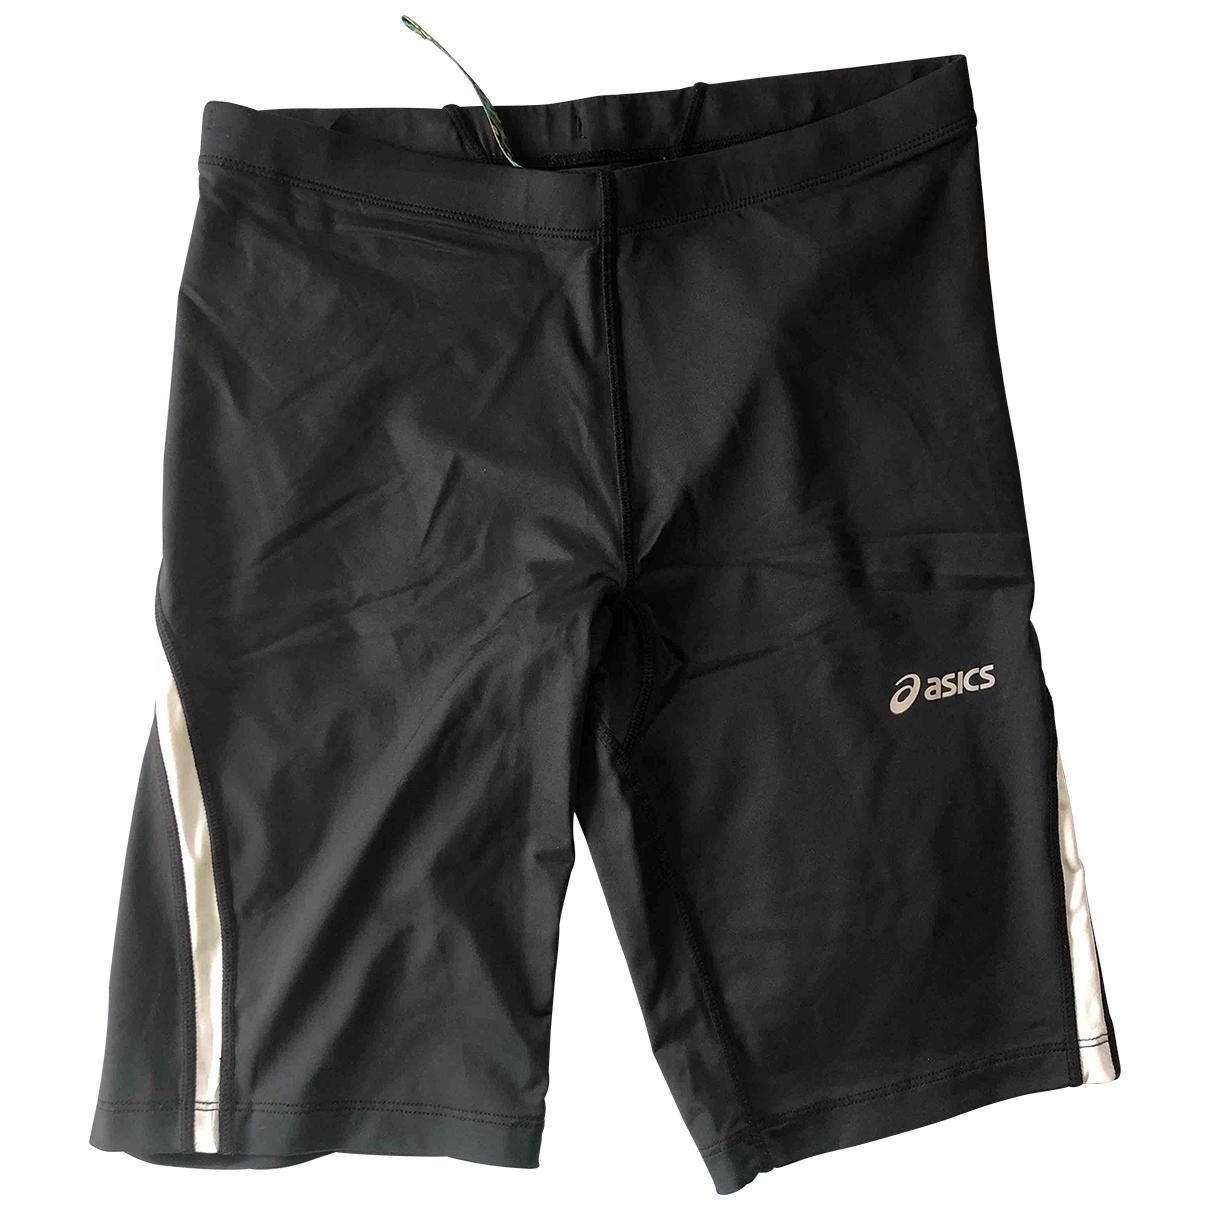 Asics \N Shorts in  Schwarz Synthetik